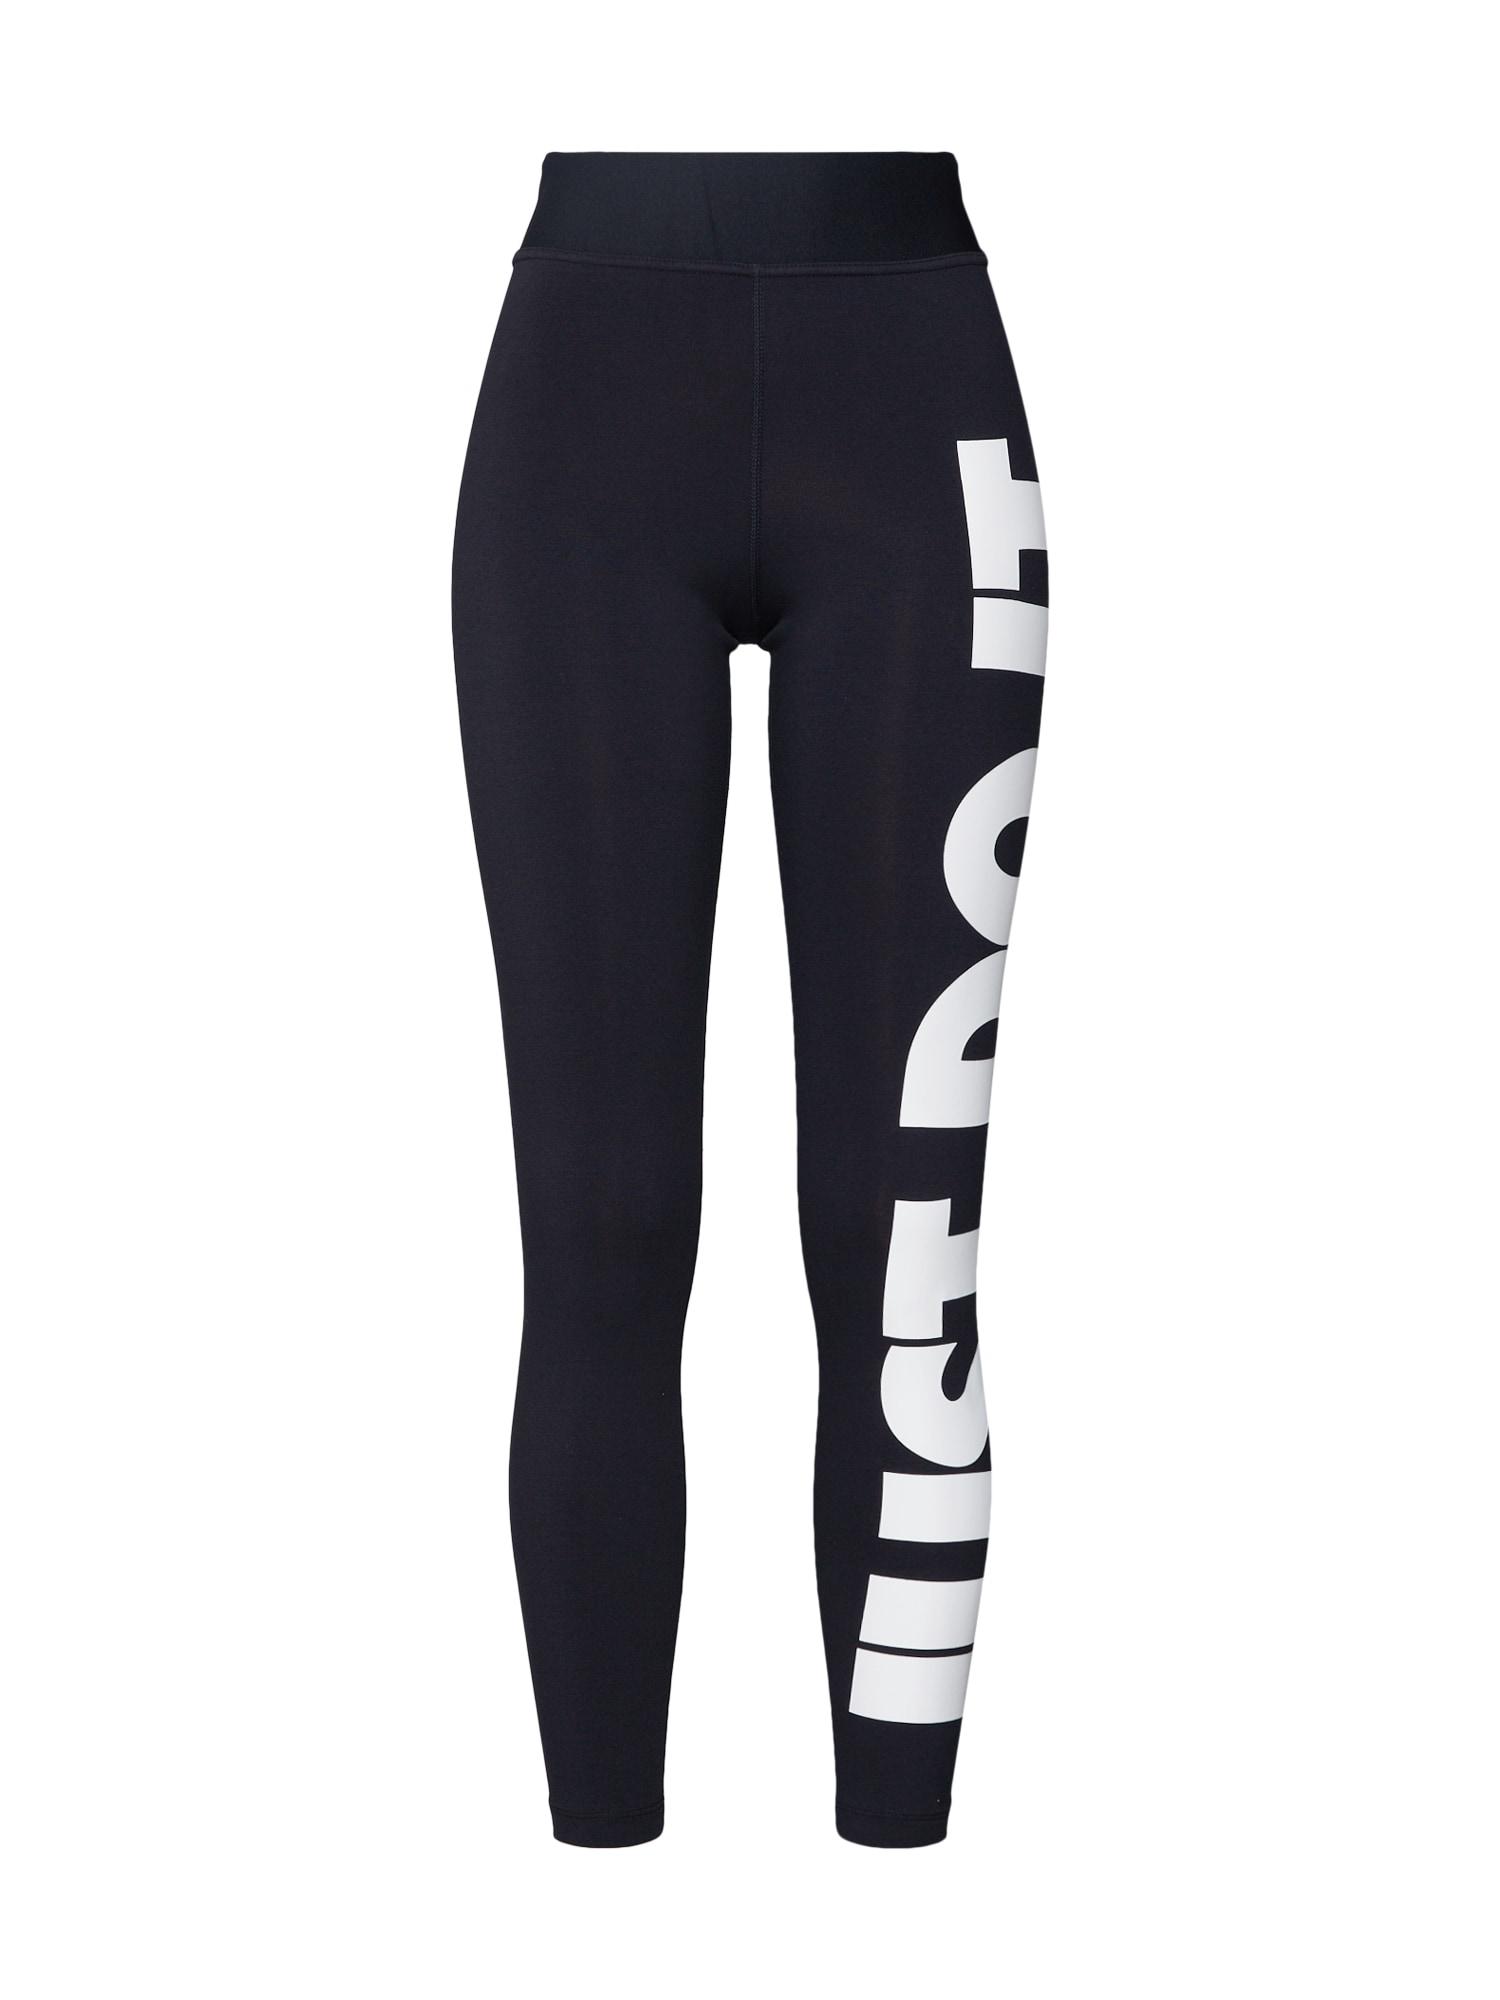 Legíny Legasee černá bílá Nike Sportswear